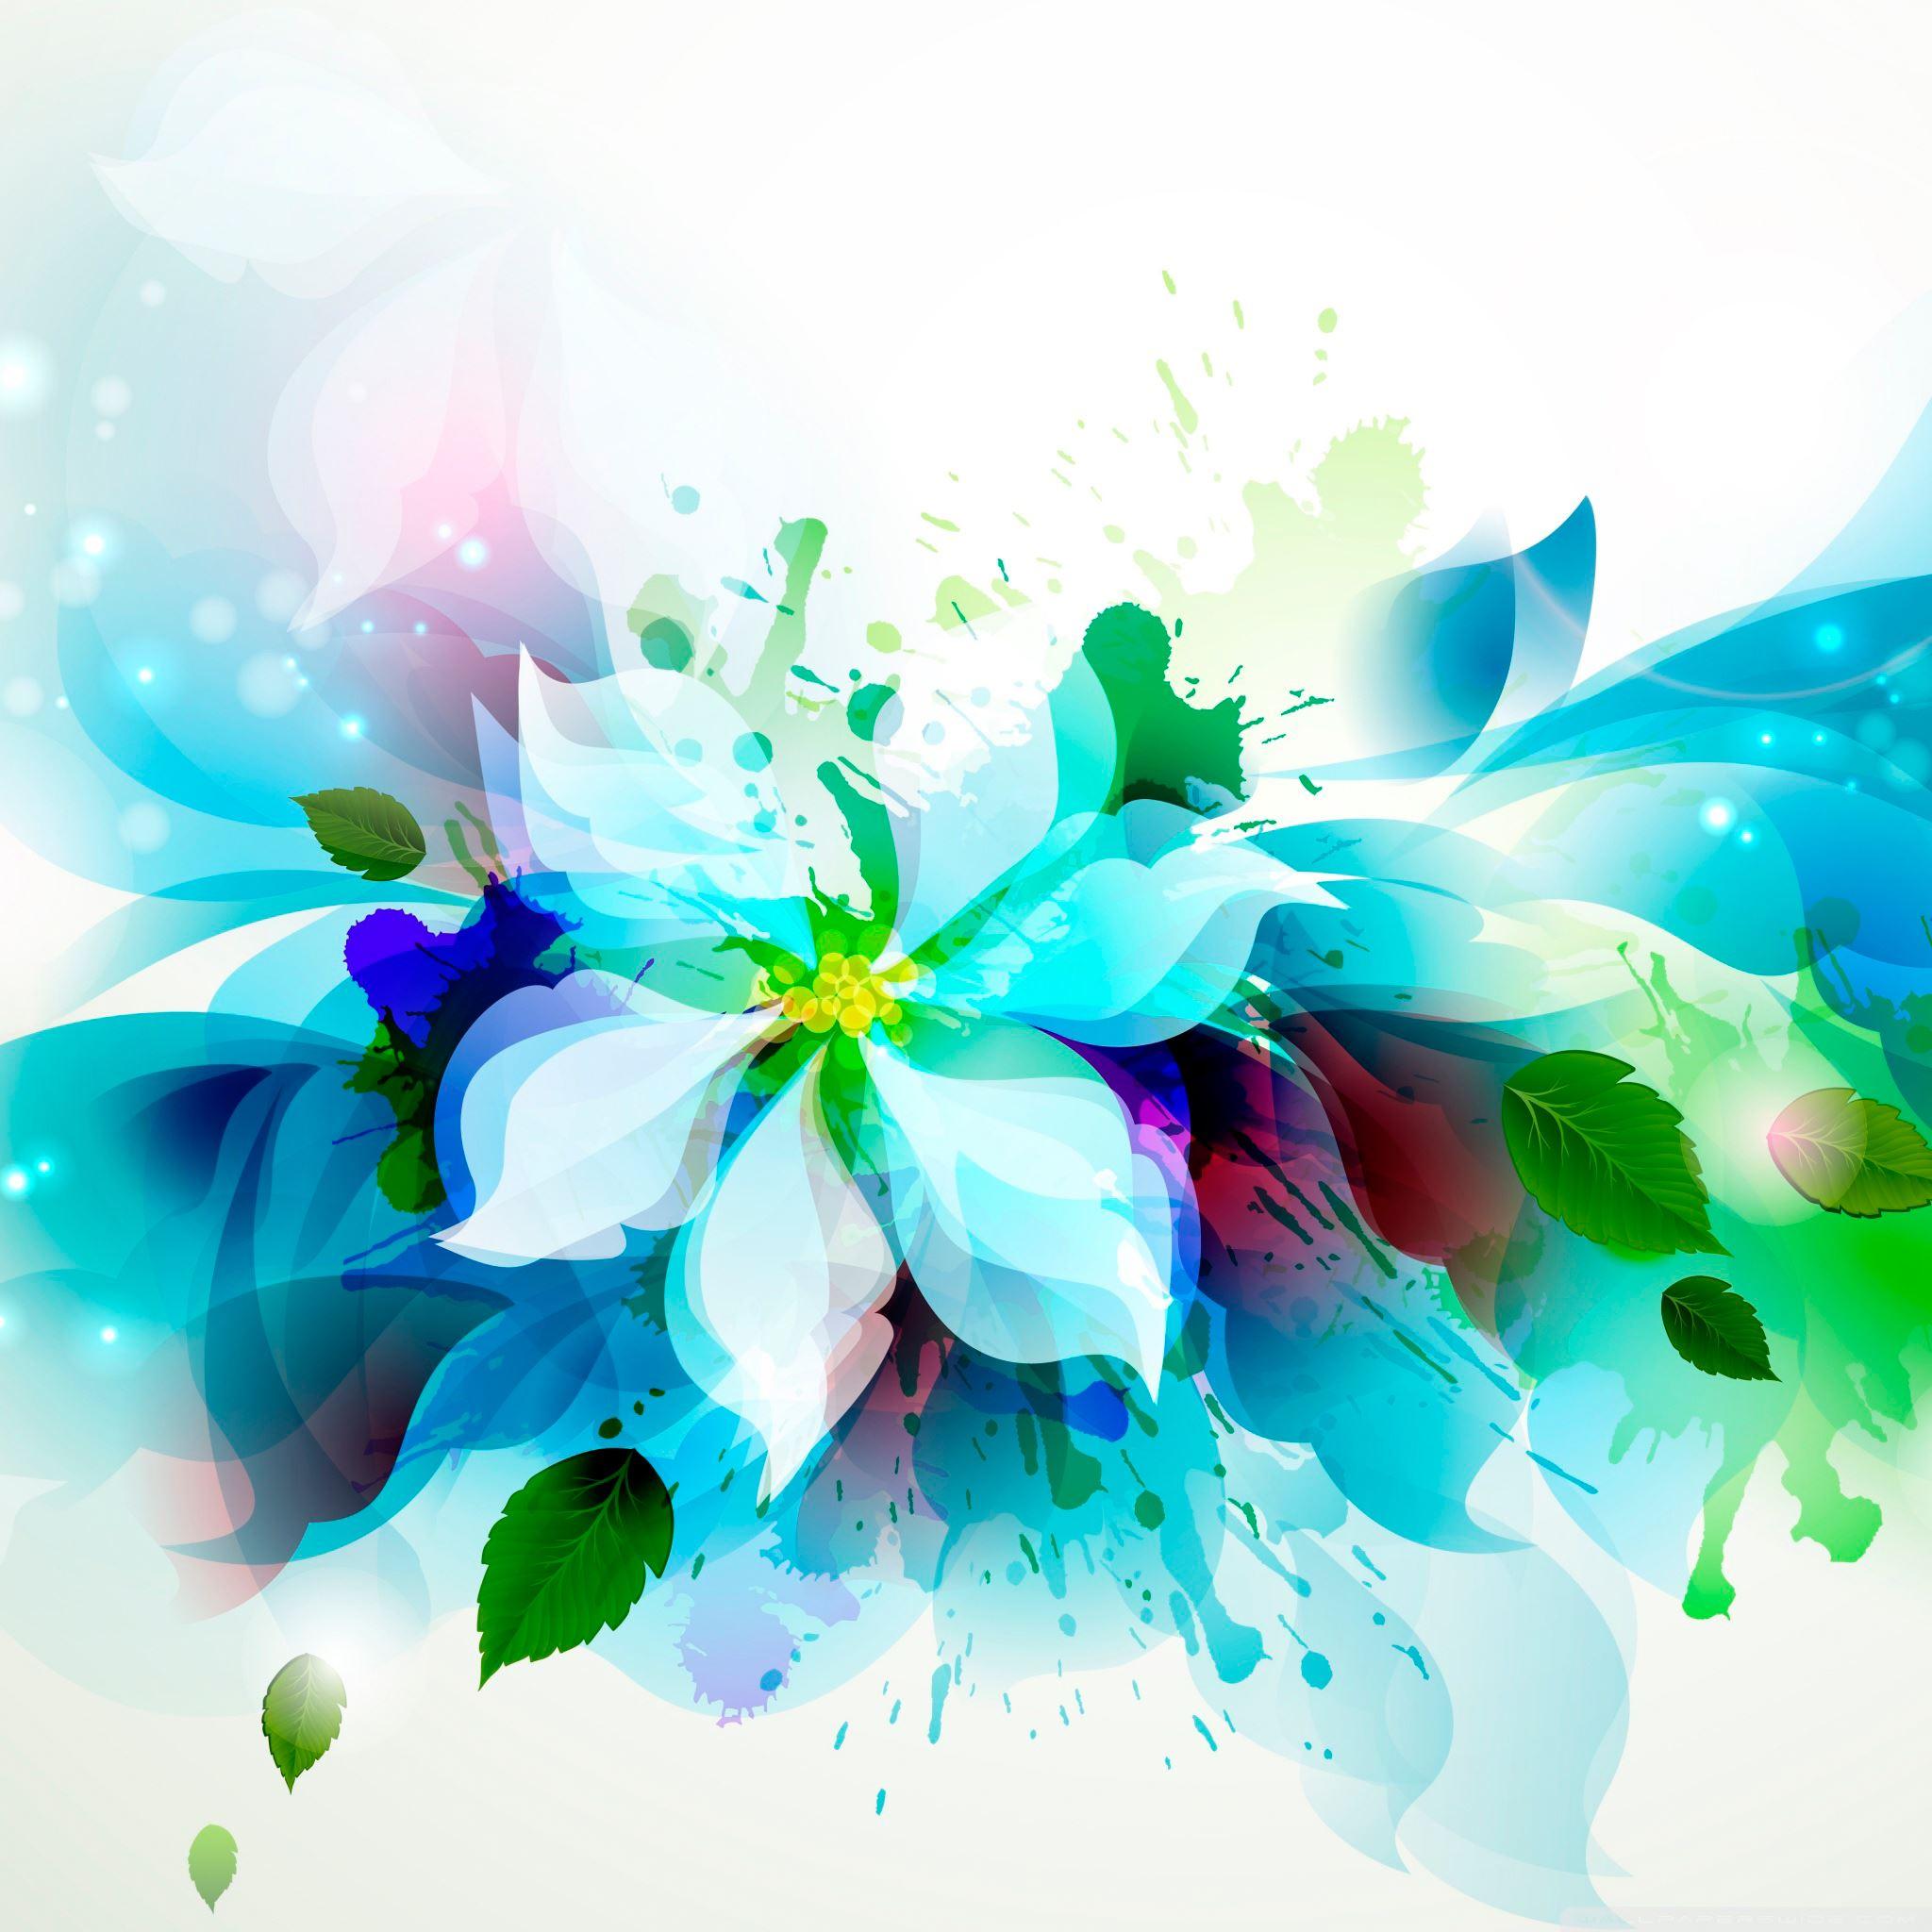 Free Ppt Backgrounds Desktop Wallpaper Flower Pink Lotus: Abstract Flower IPad Air Wallpaper Download